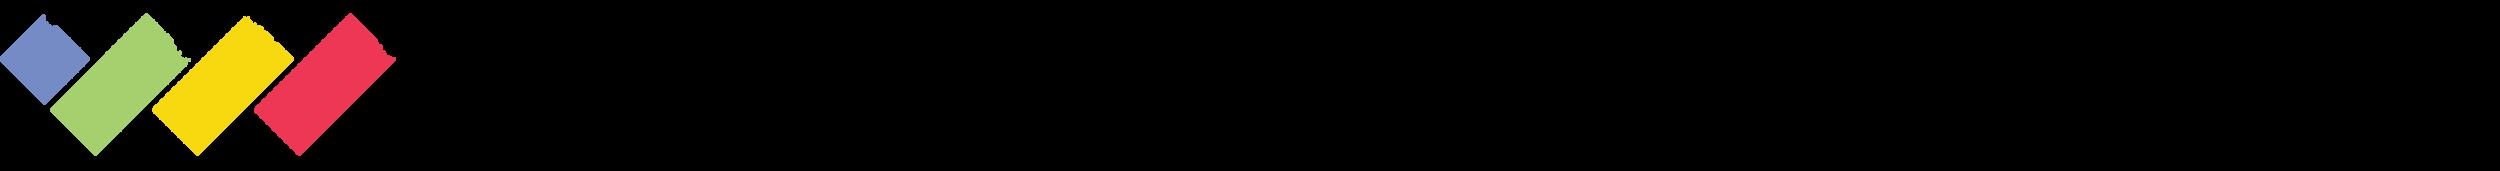 VW_logo_long_left_aligned-01.png